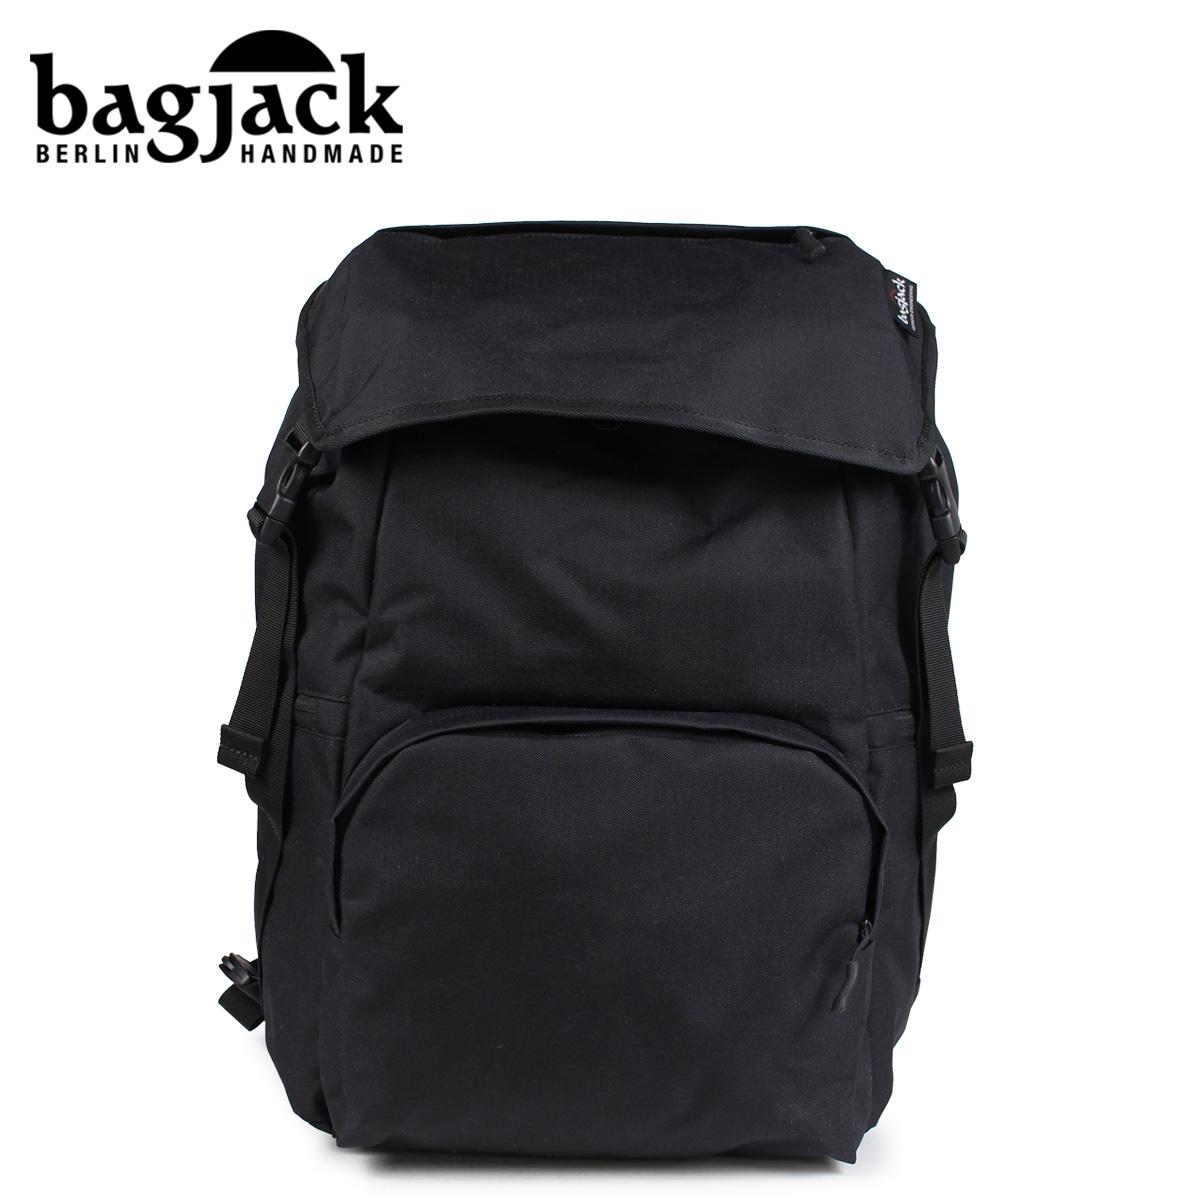 bagjack RUCKSACK CLASSIC S バッグジャック リュック バックパック メンズ レディース 17L ブラック